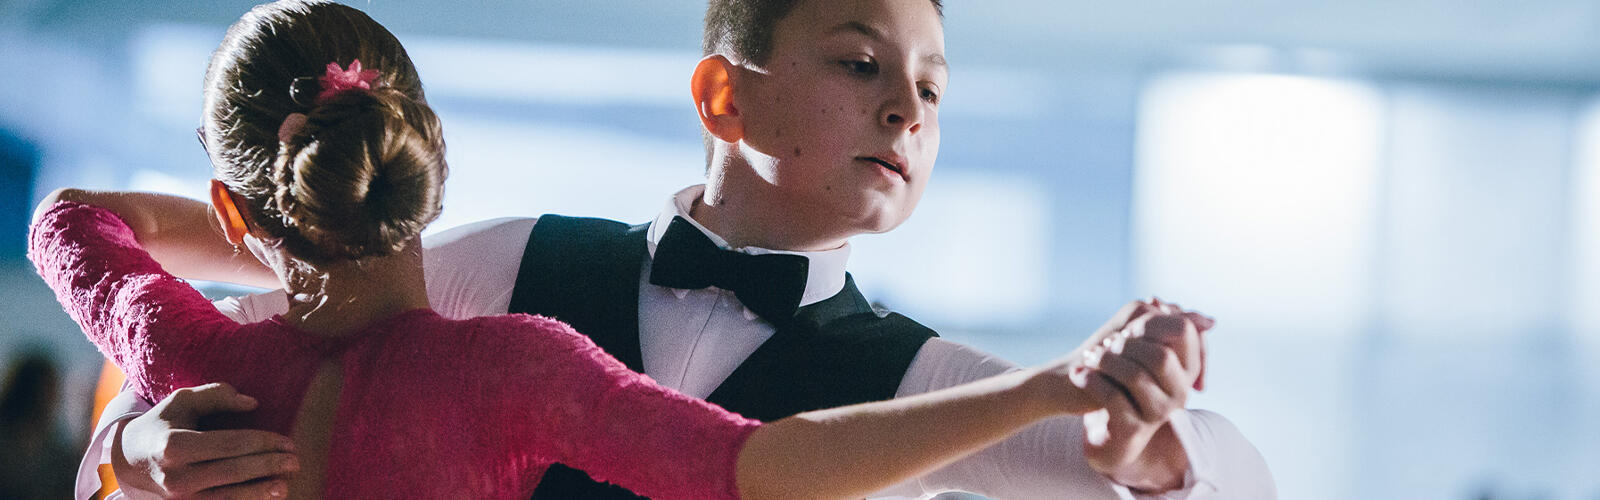 Lukáš Brůžek & Anna Čubanová COOL DANCE